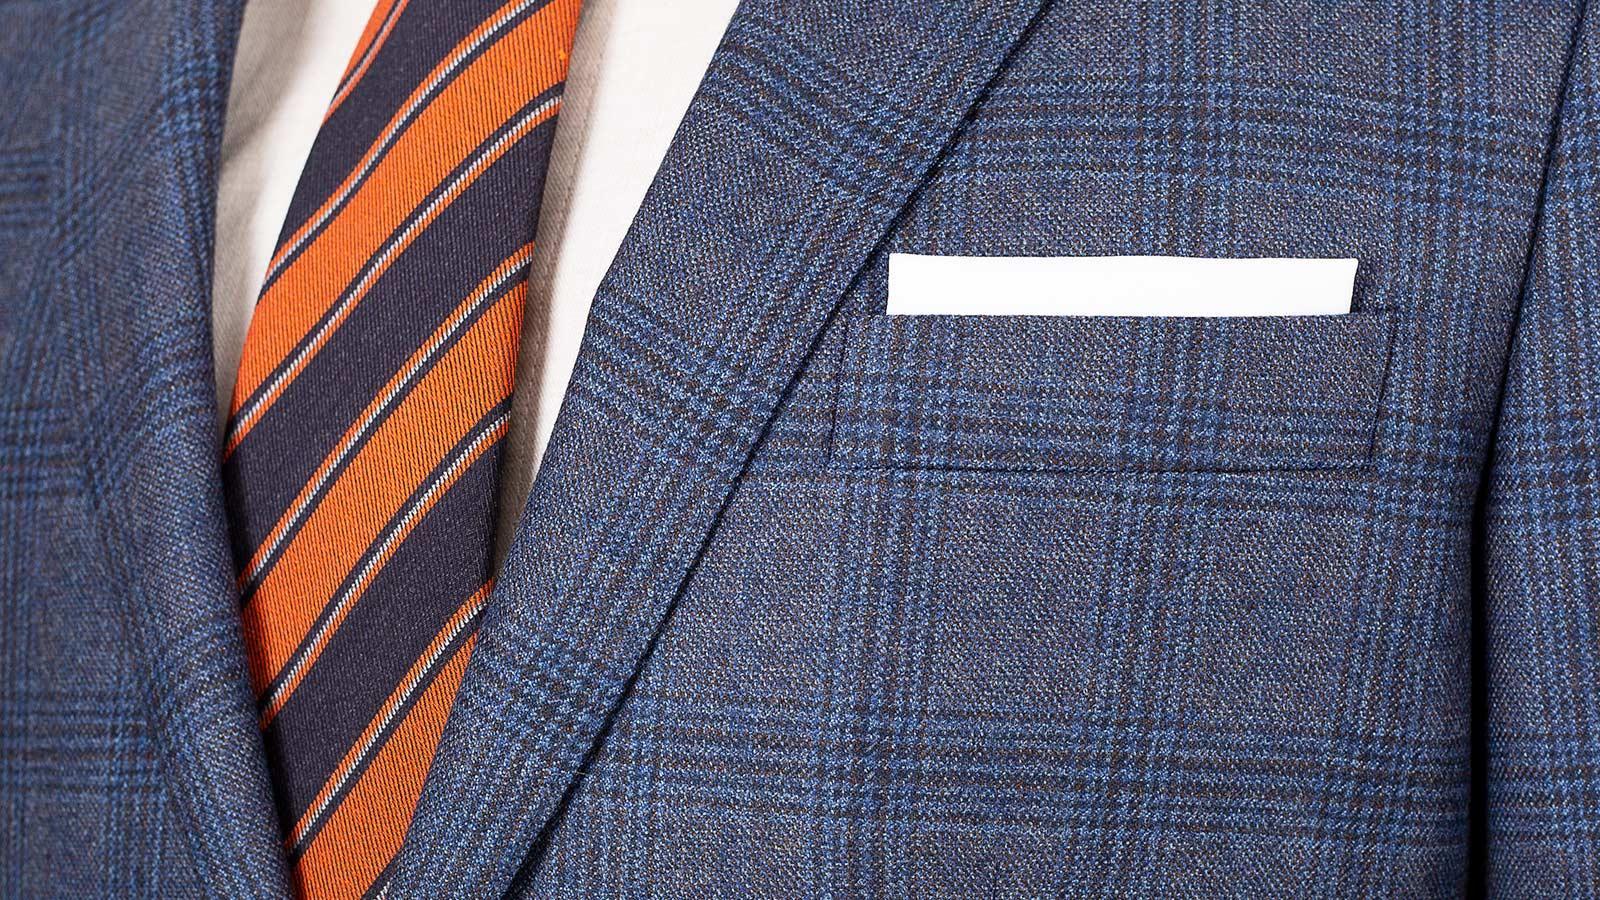 Steel Blue Plaid Wool & Cashmere Suit - slider image 1